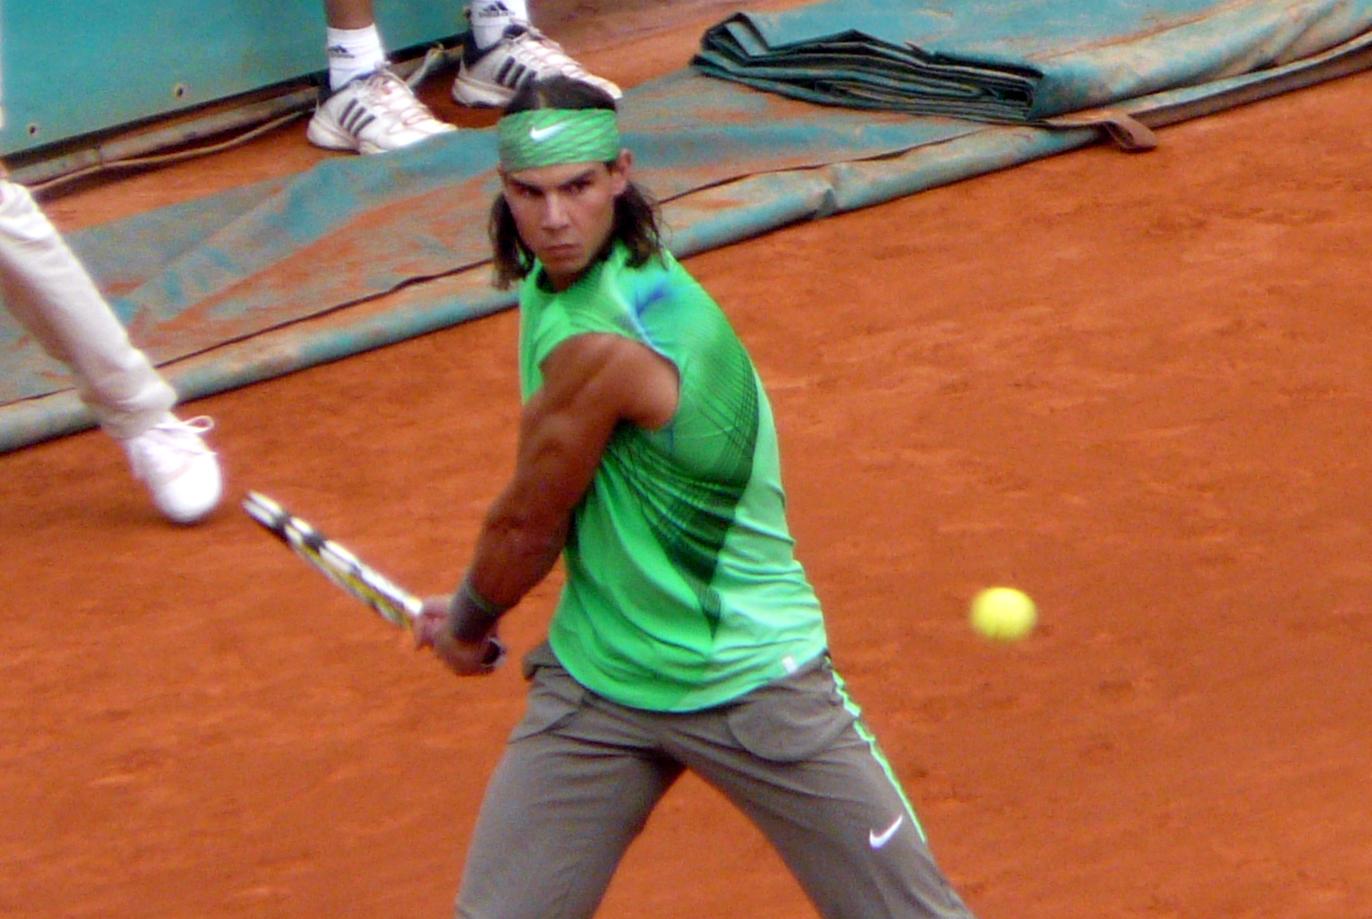 Nadal Wikipedia: File:Rafael Nadal At The 2008 French Open 11.jpg